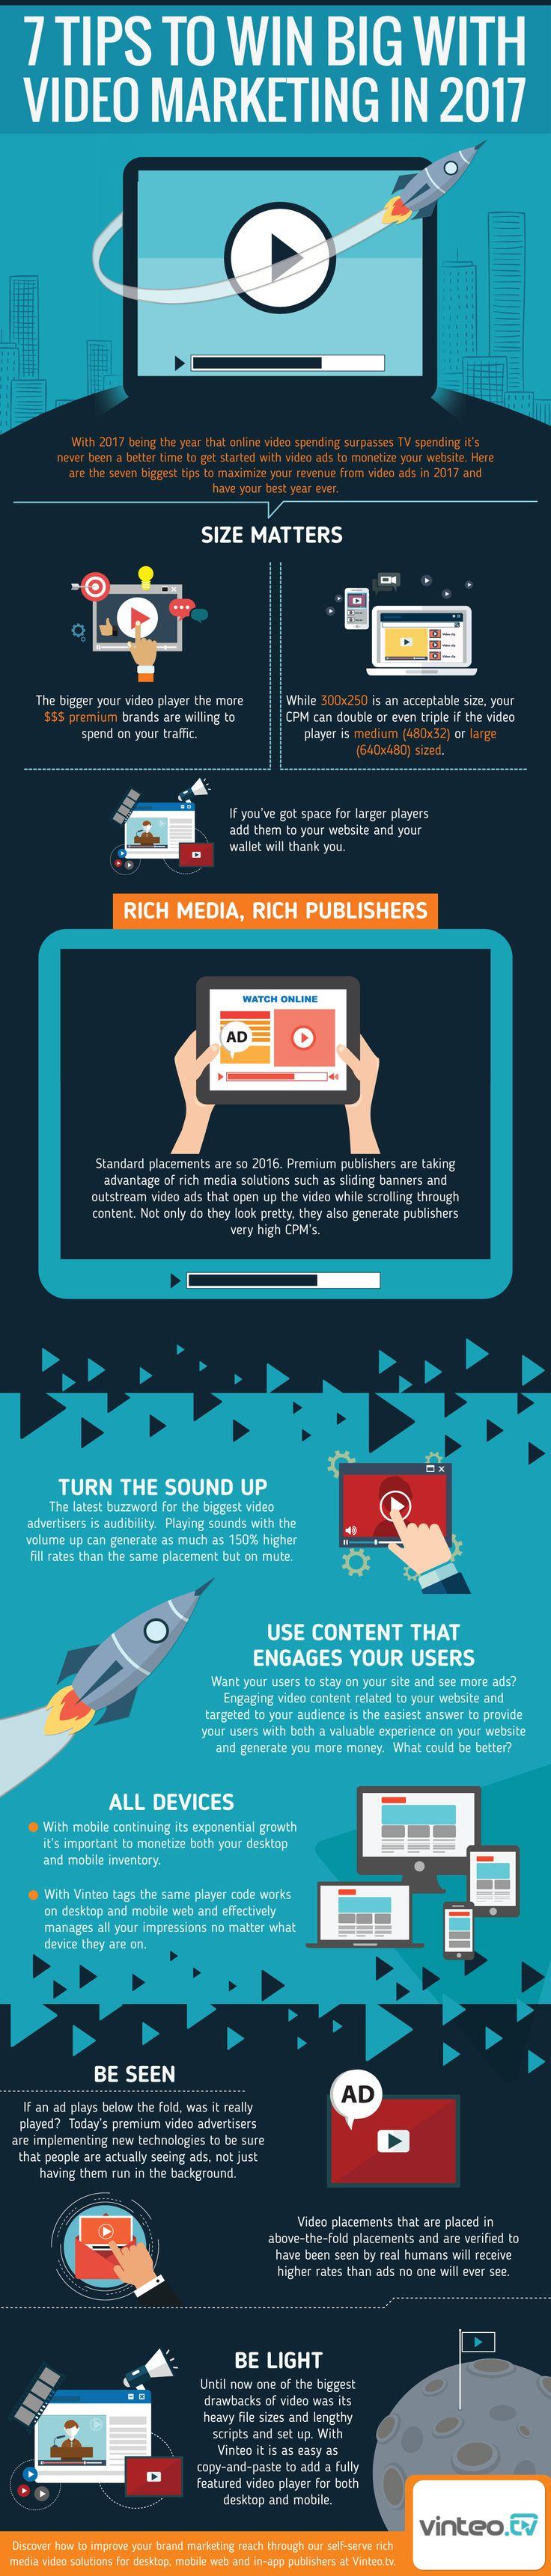 25 best Video Marketing Services images on Pinterest   Online ...